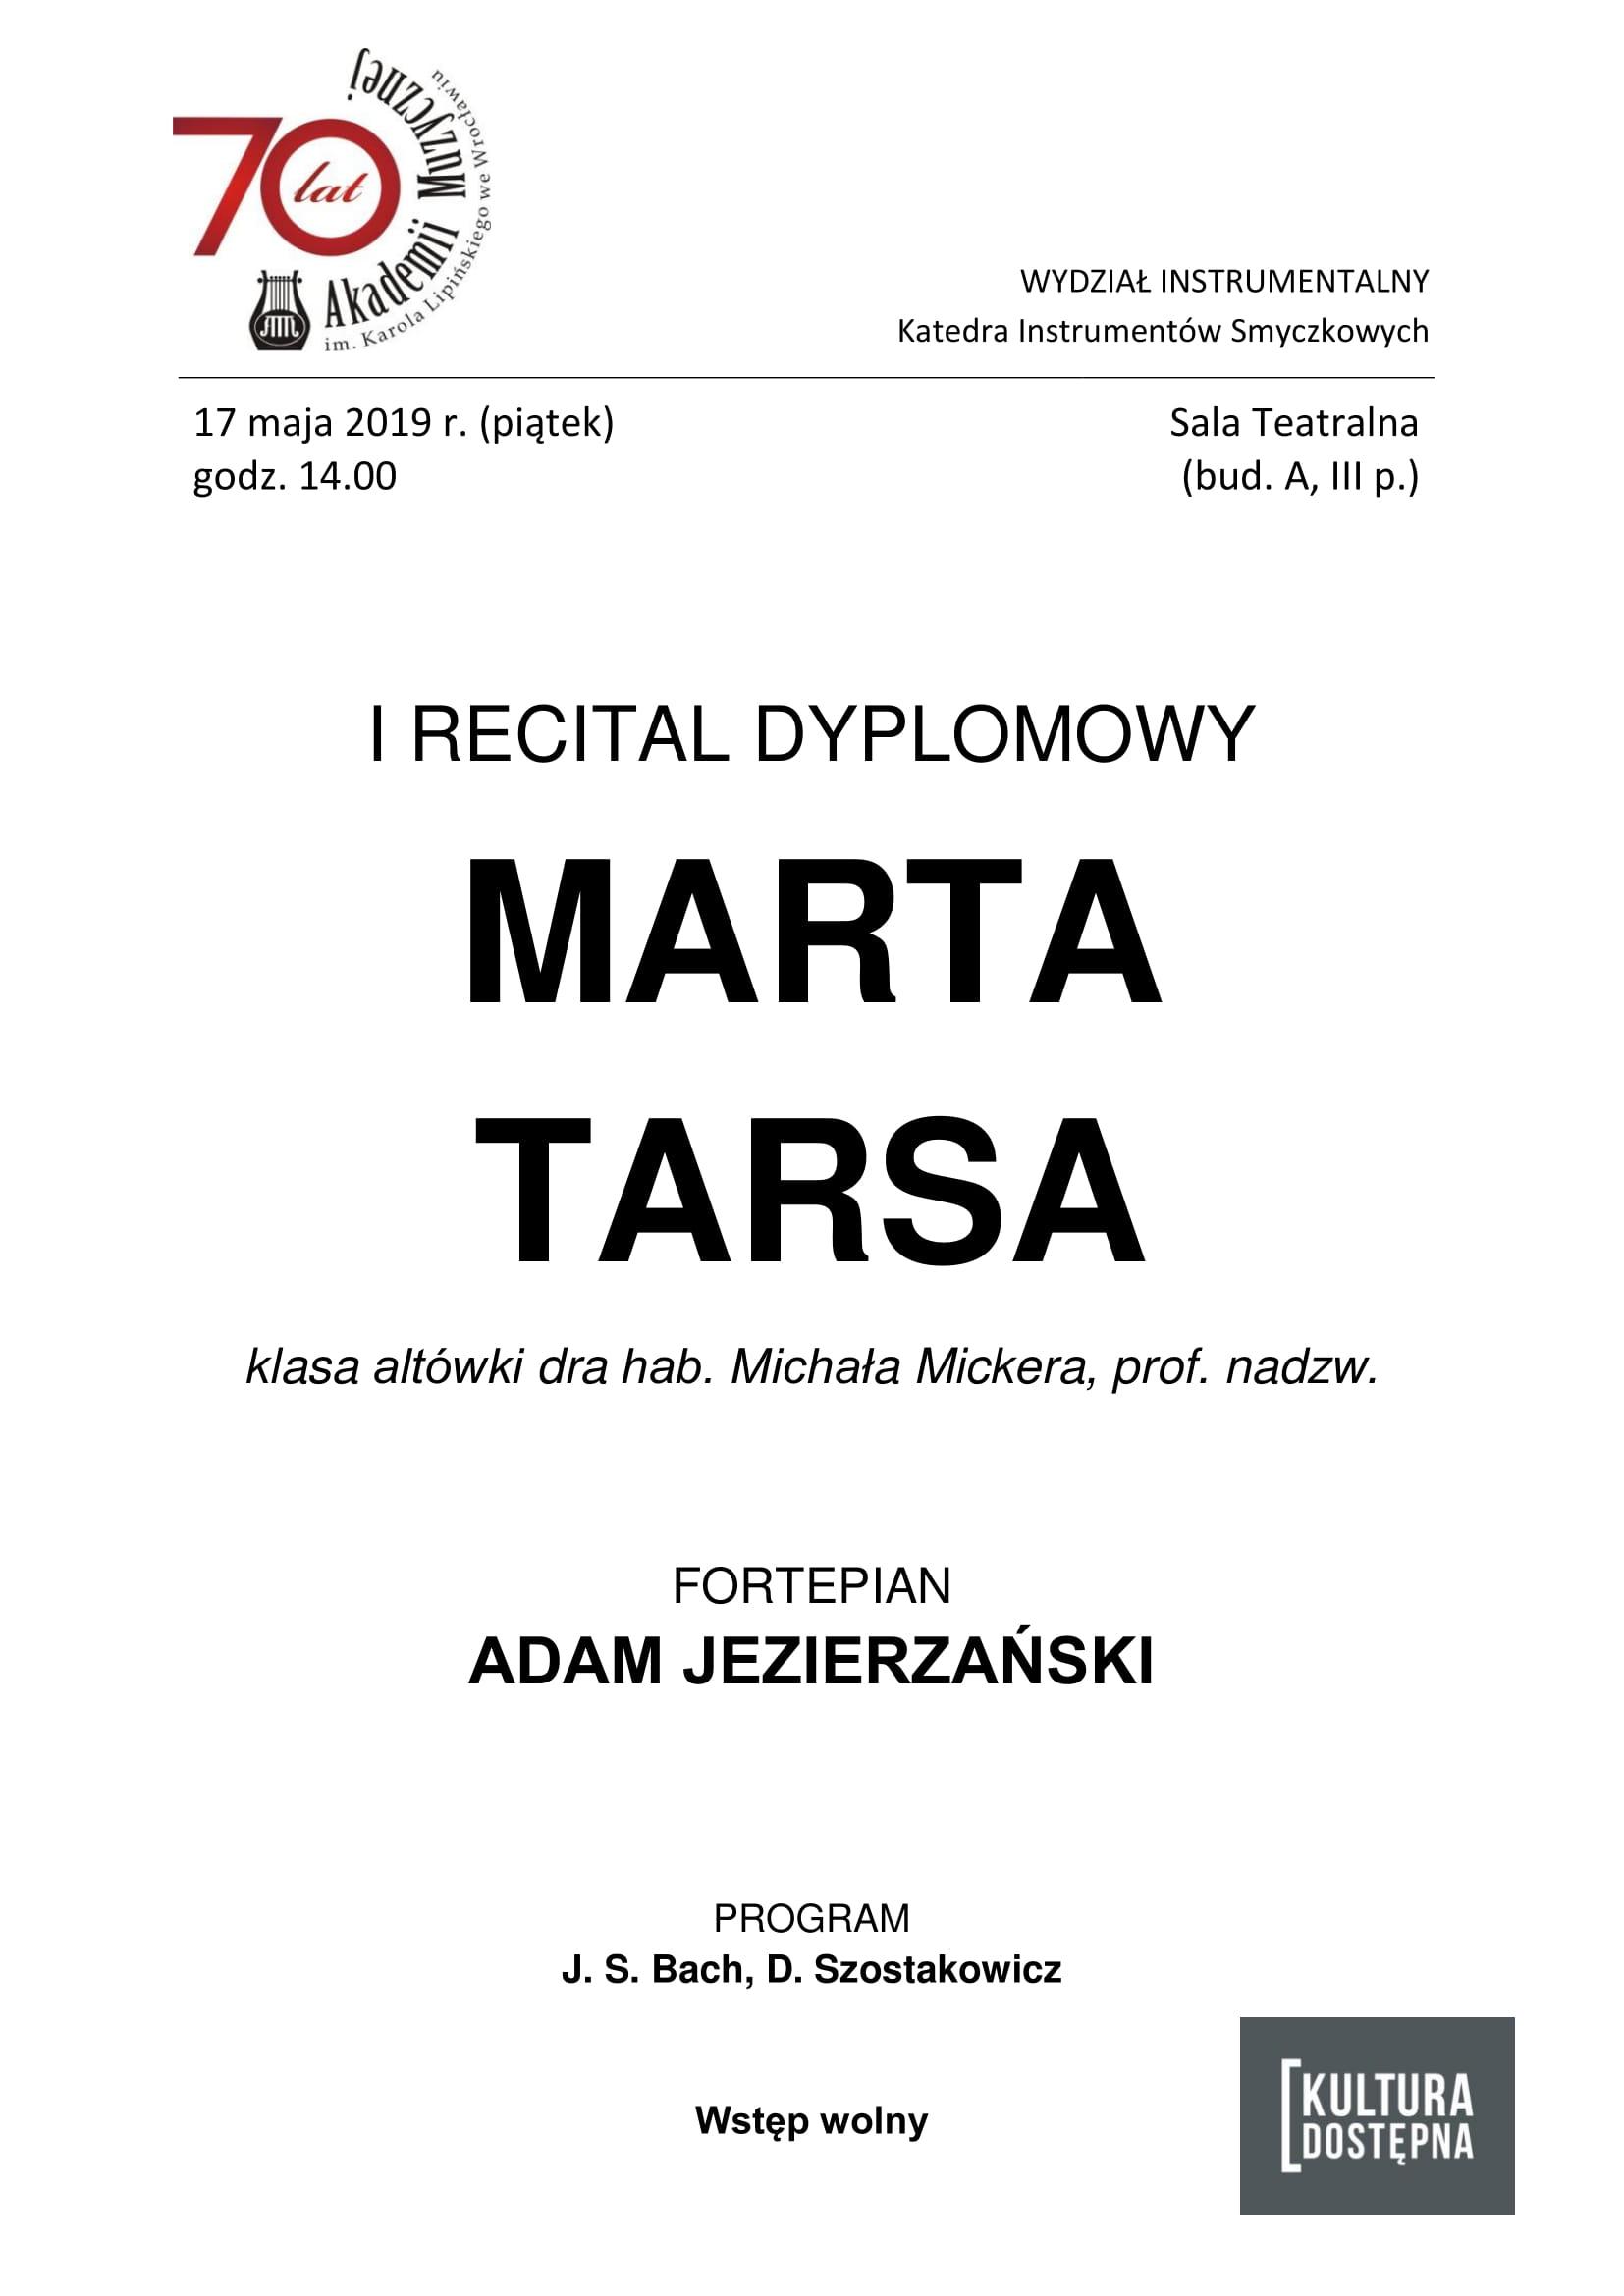 I recital dyplomowy - Marta Tarsa (altówka)